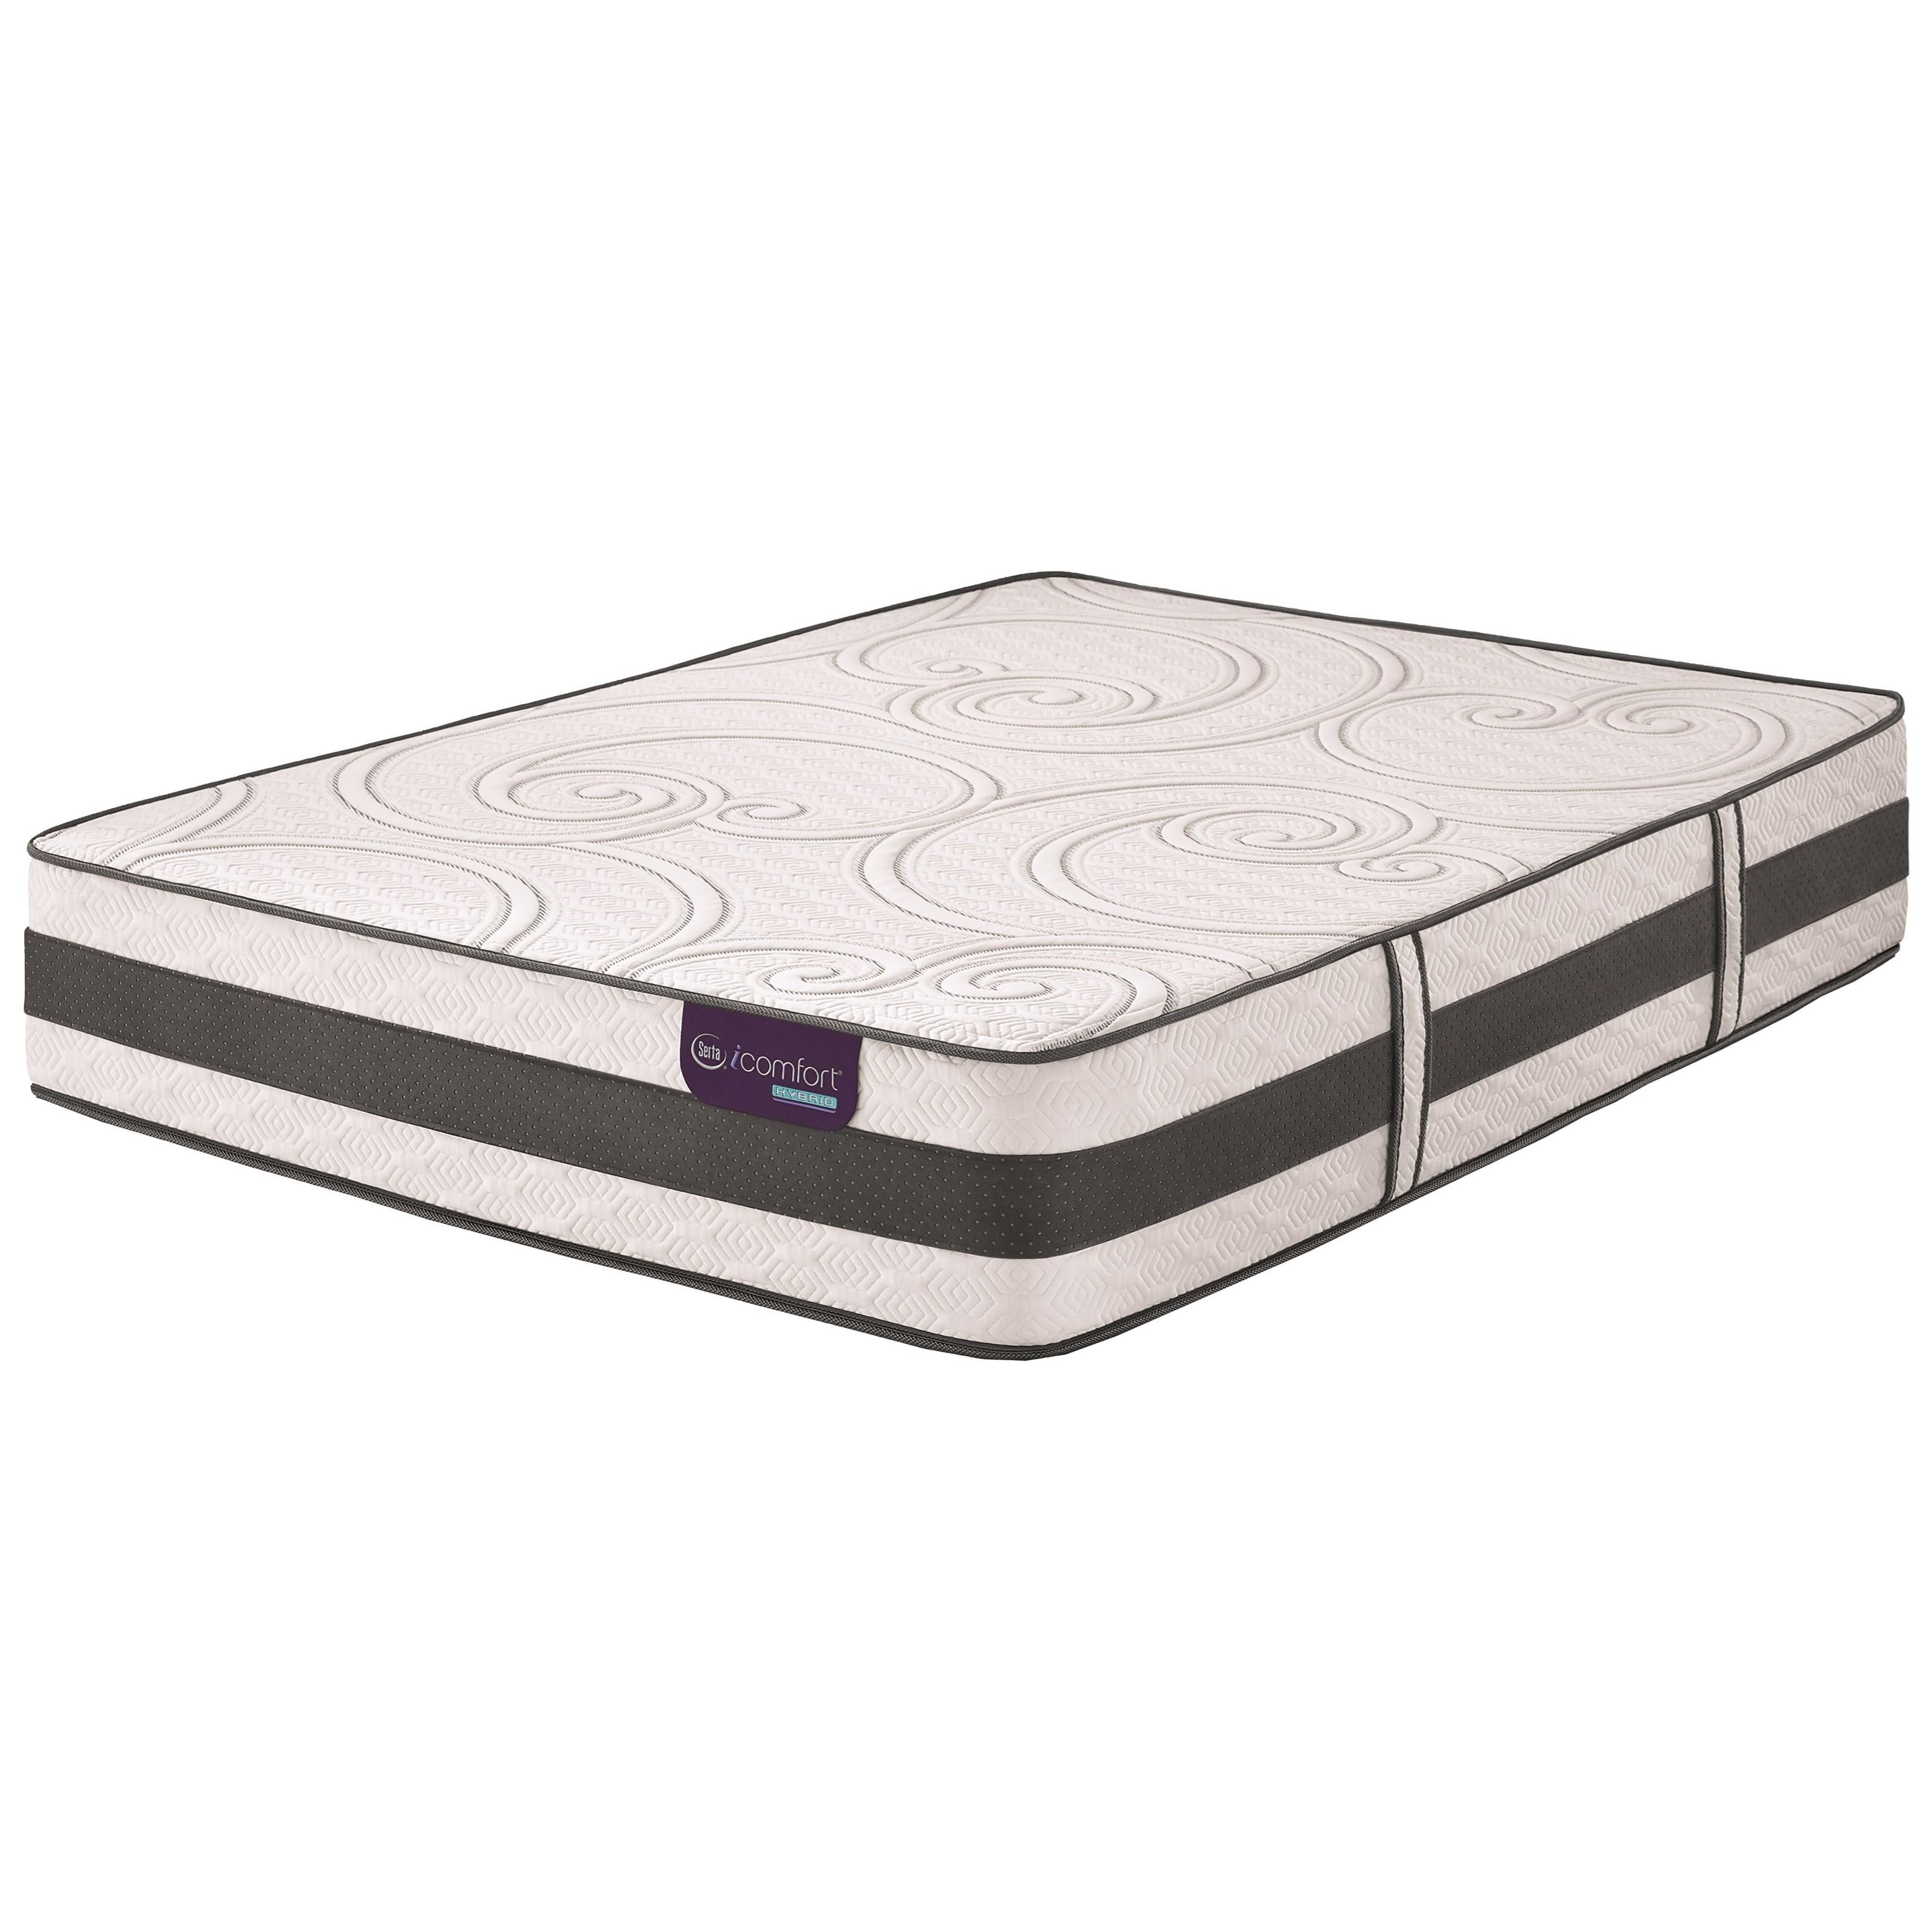 Serta iComfort Hybrid Discoverer Twin XL Firm Hybrid Smooth Top Mattress - Item Number: DiscovererFirm-TXL